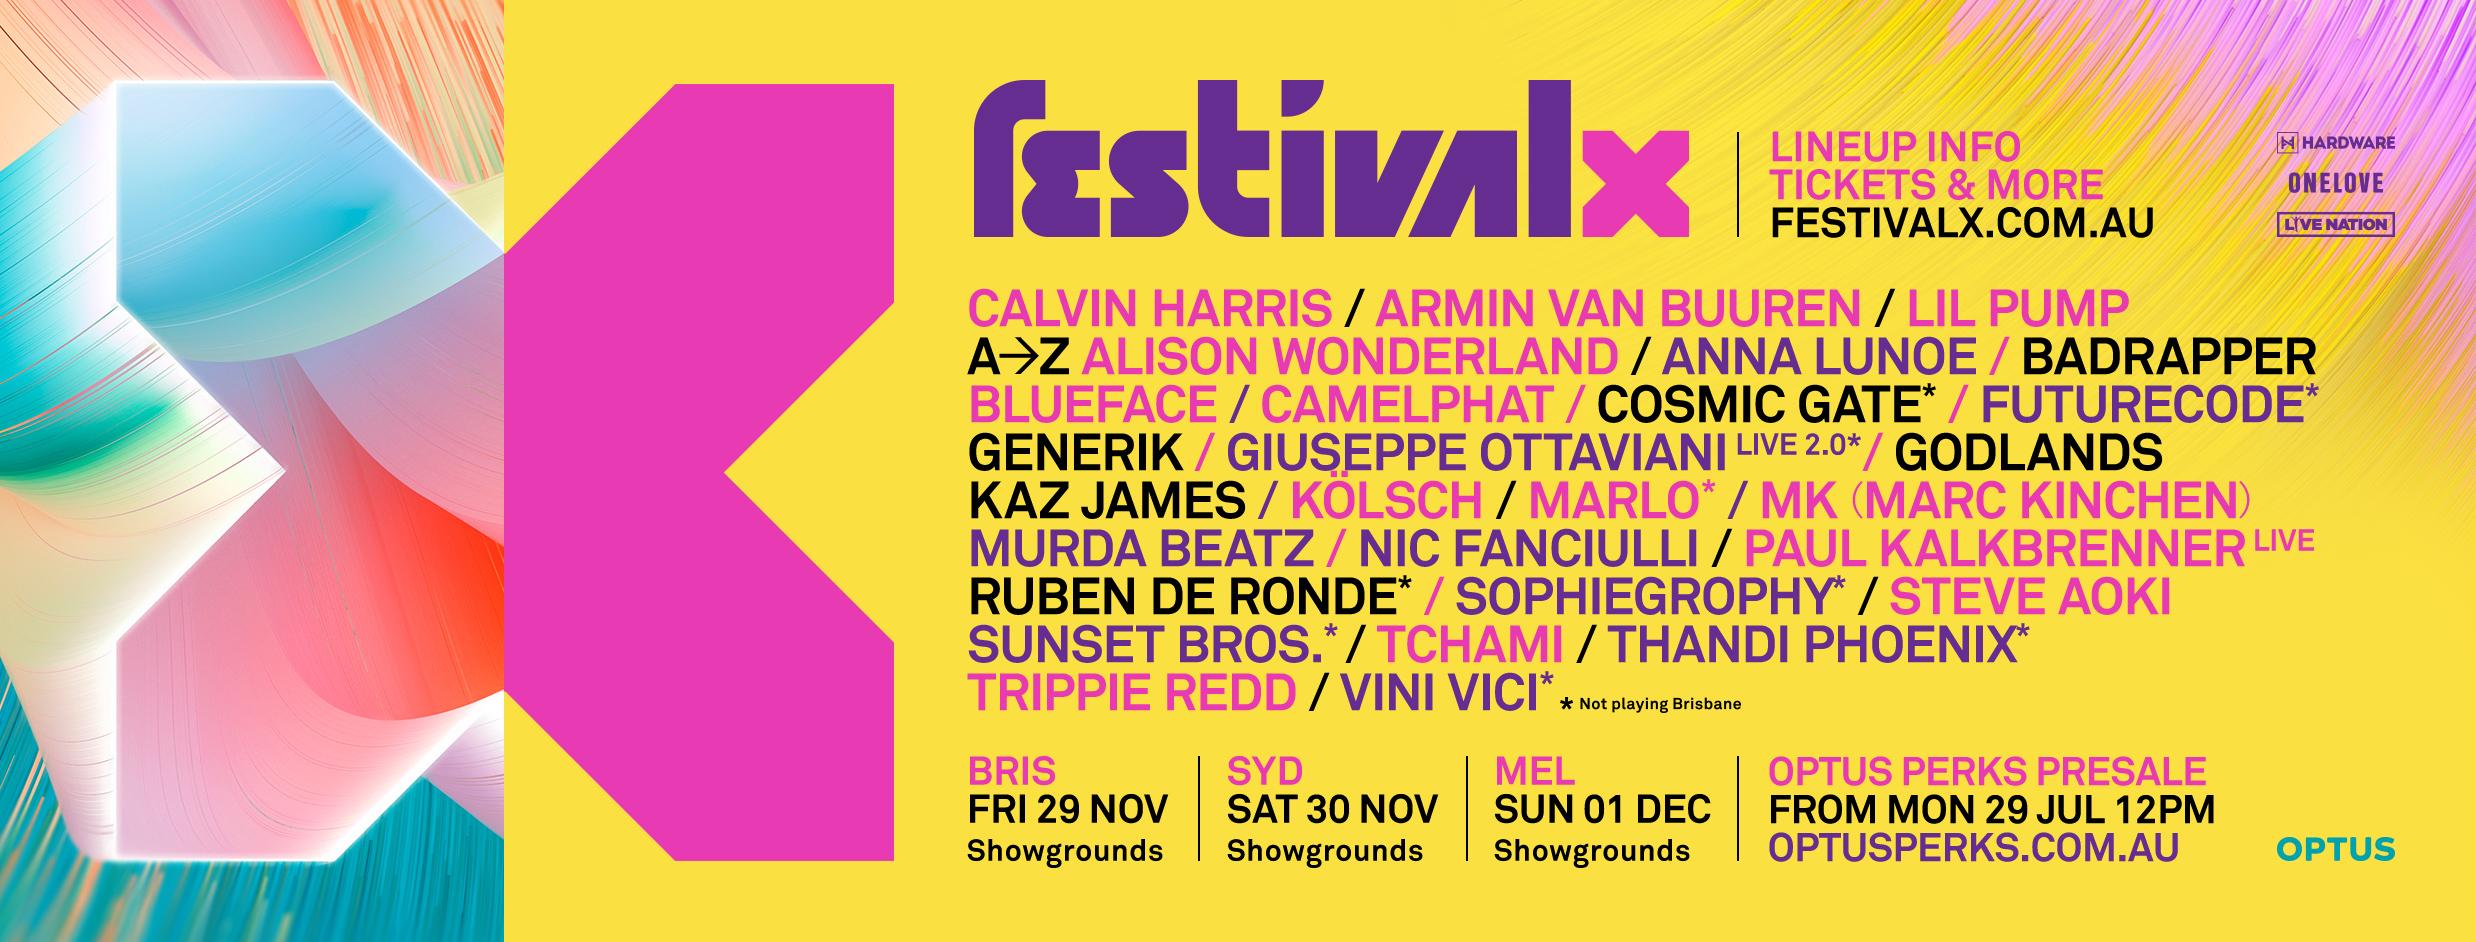 Festival-X-facebook-cover-lineup-static-1.jpg